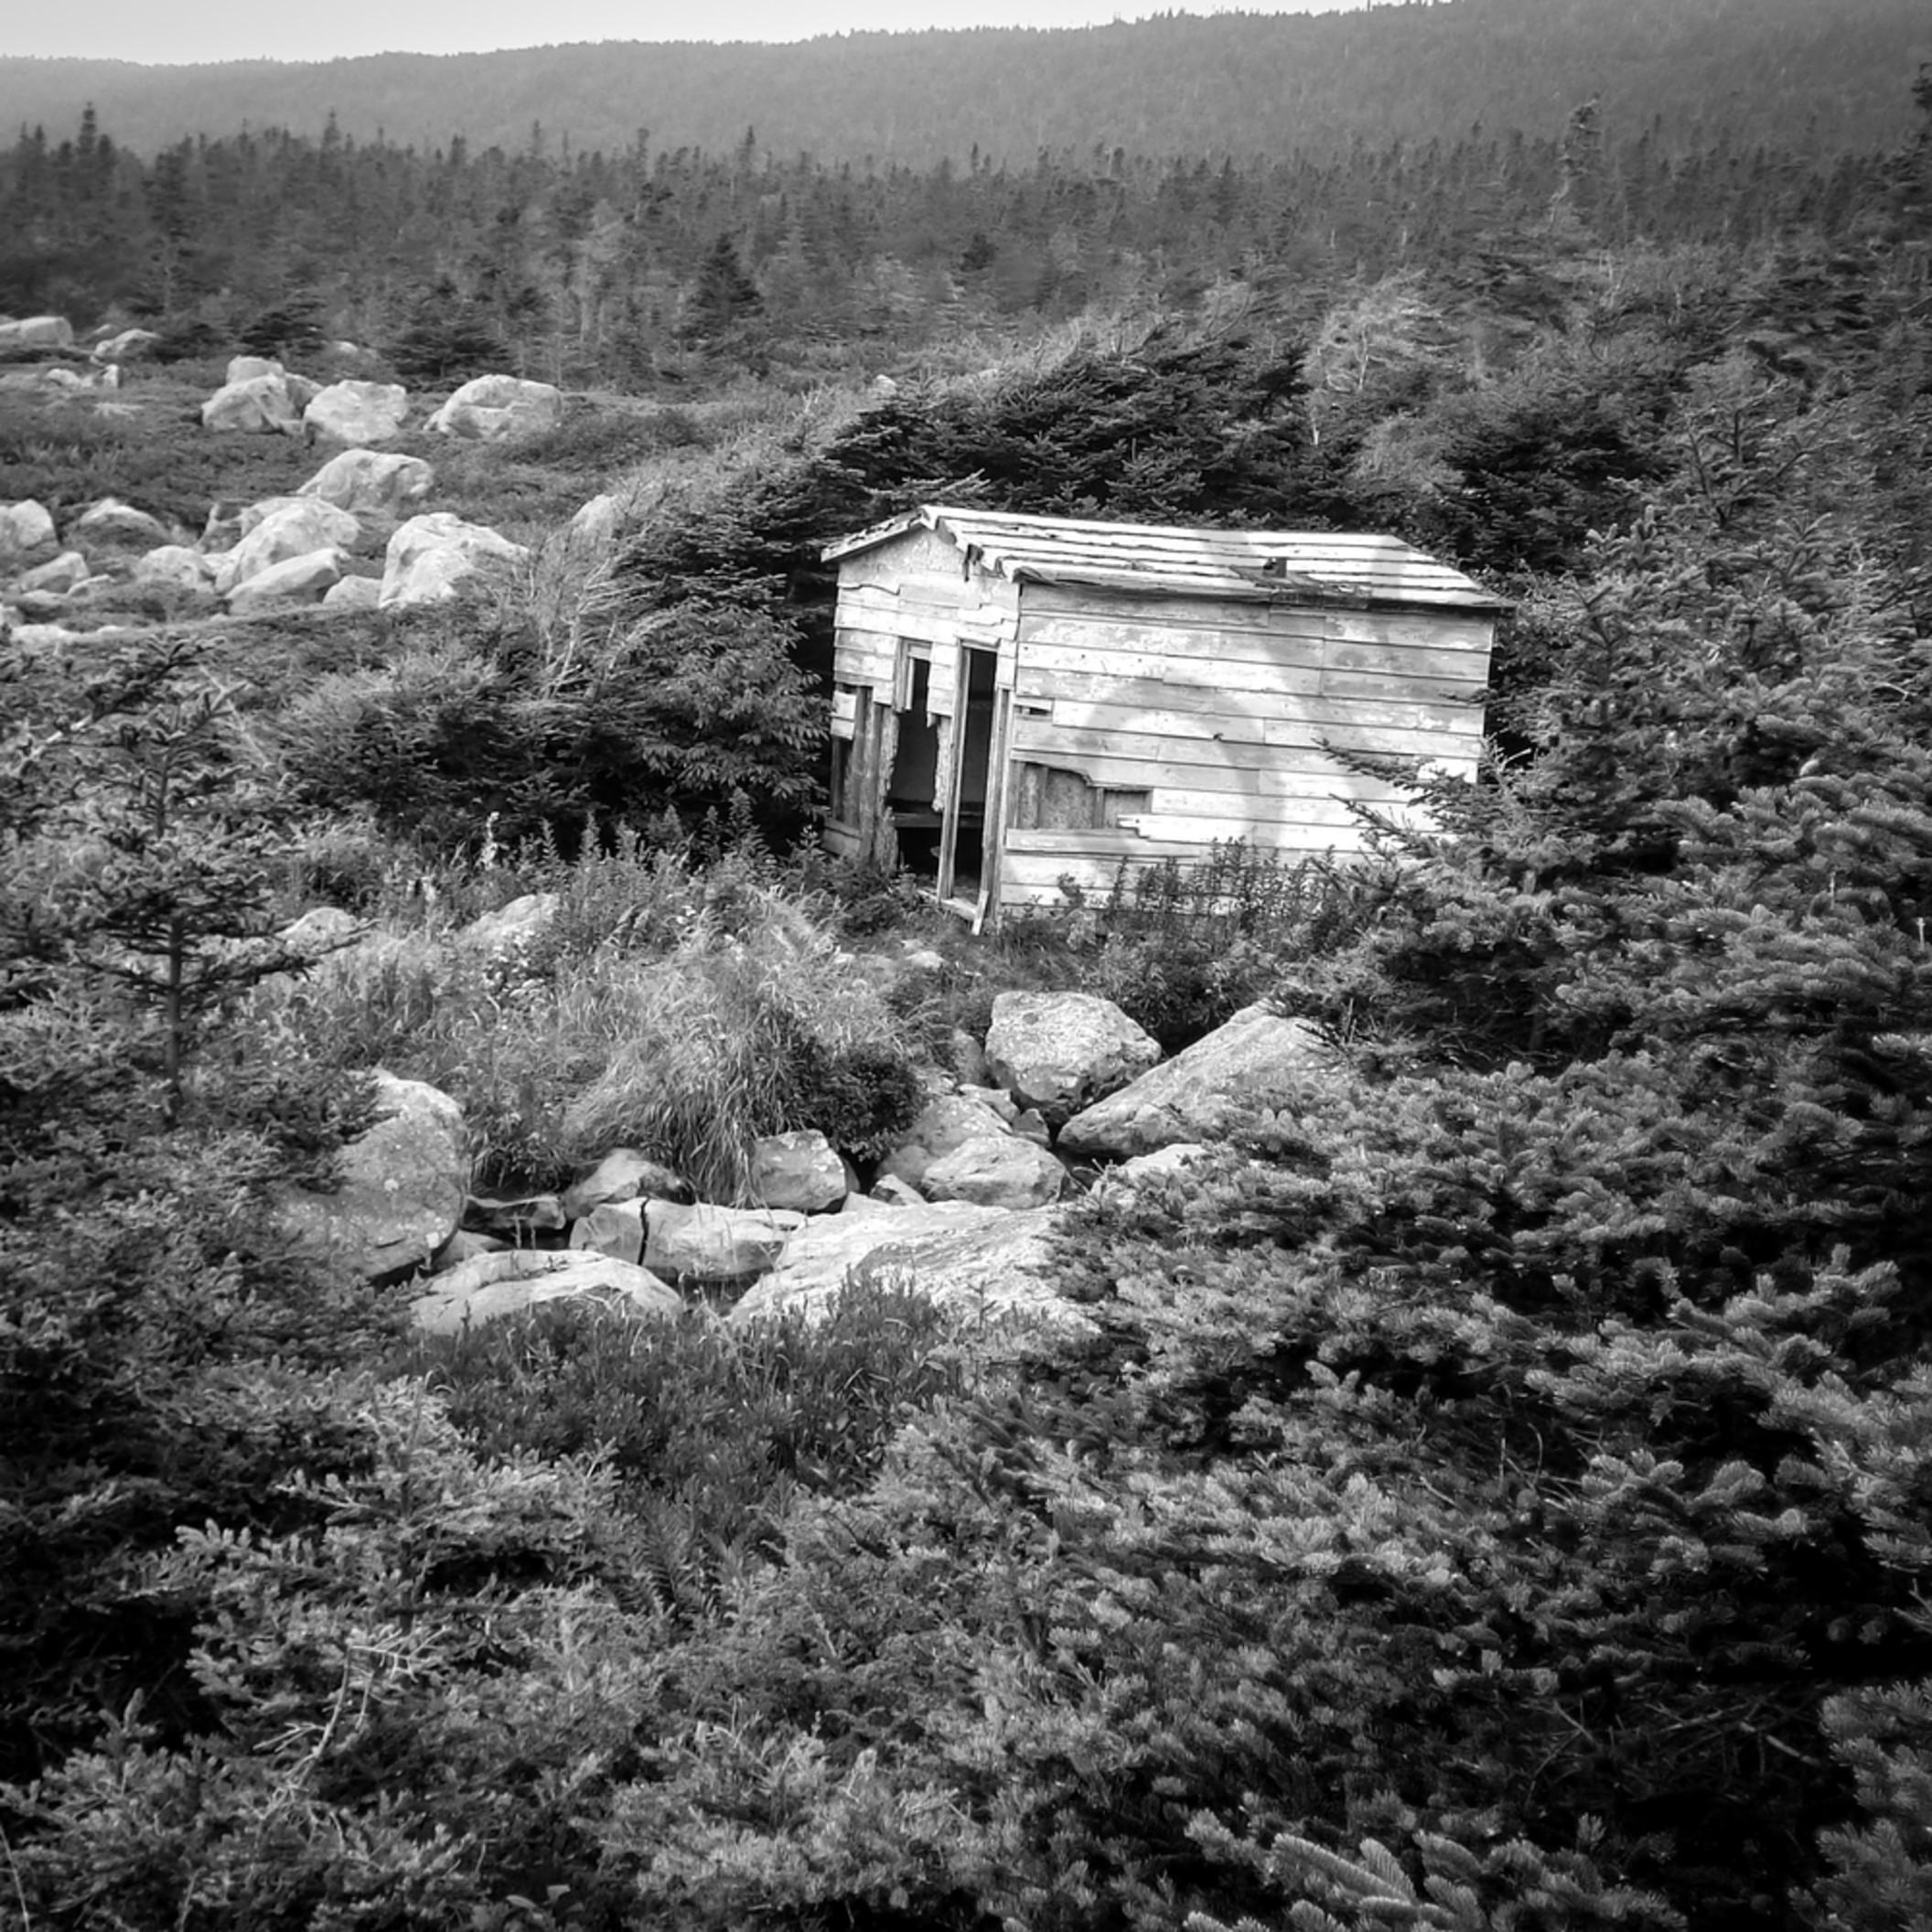 Abandoned fishing shack dnjbnc